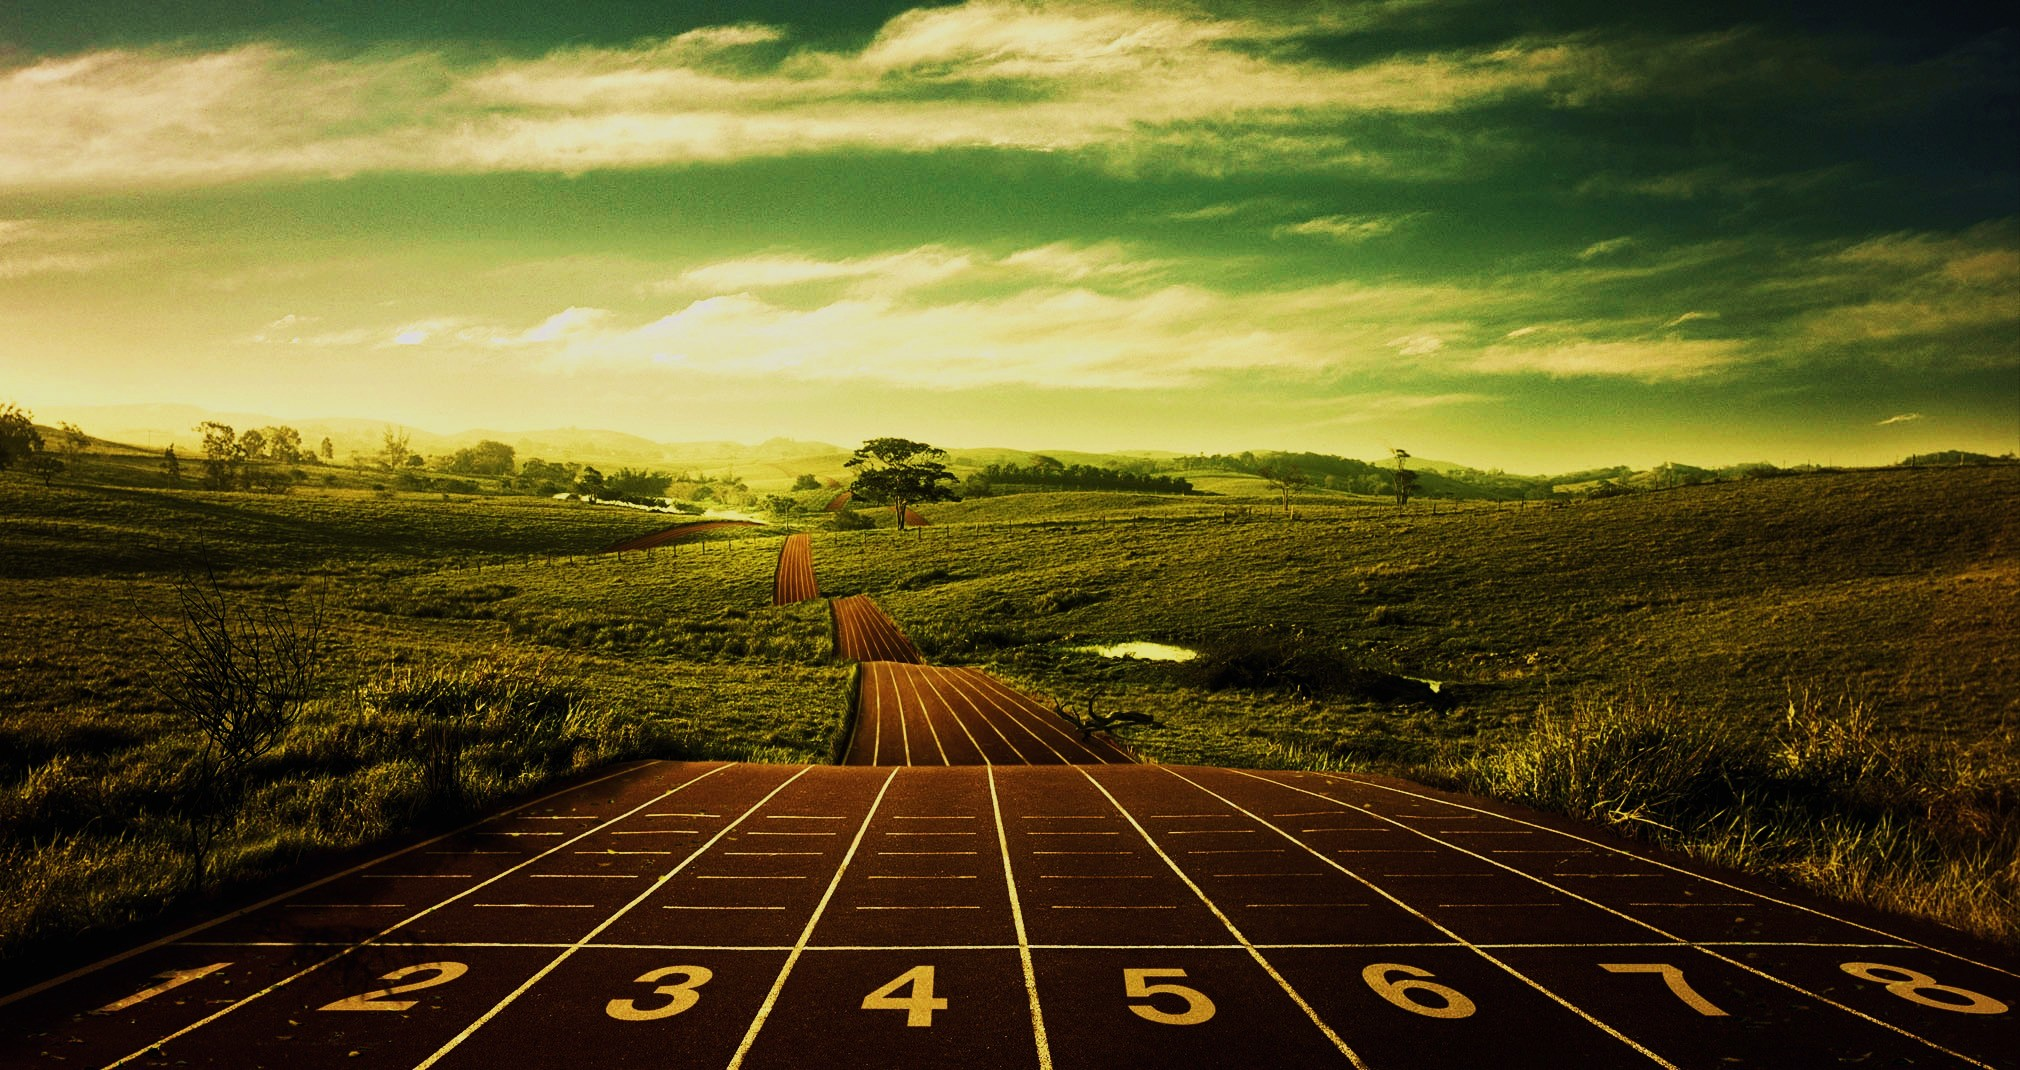 [45+] Marathon Running Wallpaper On WallpaperSafari